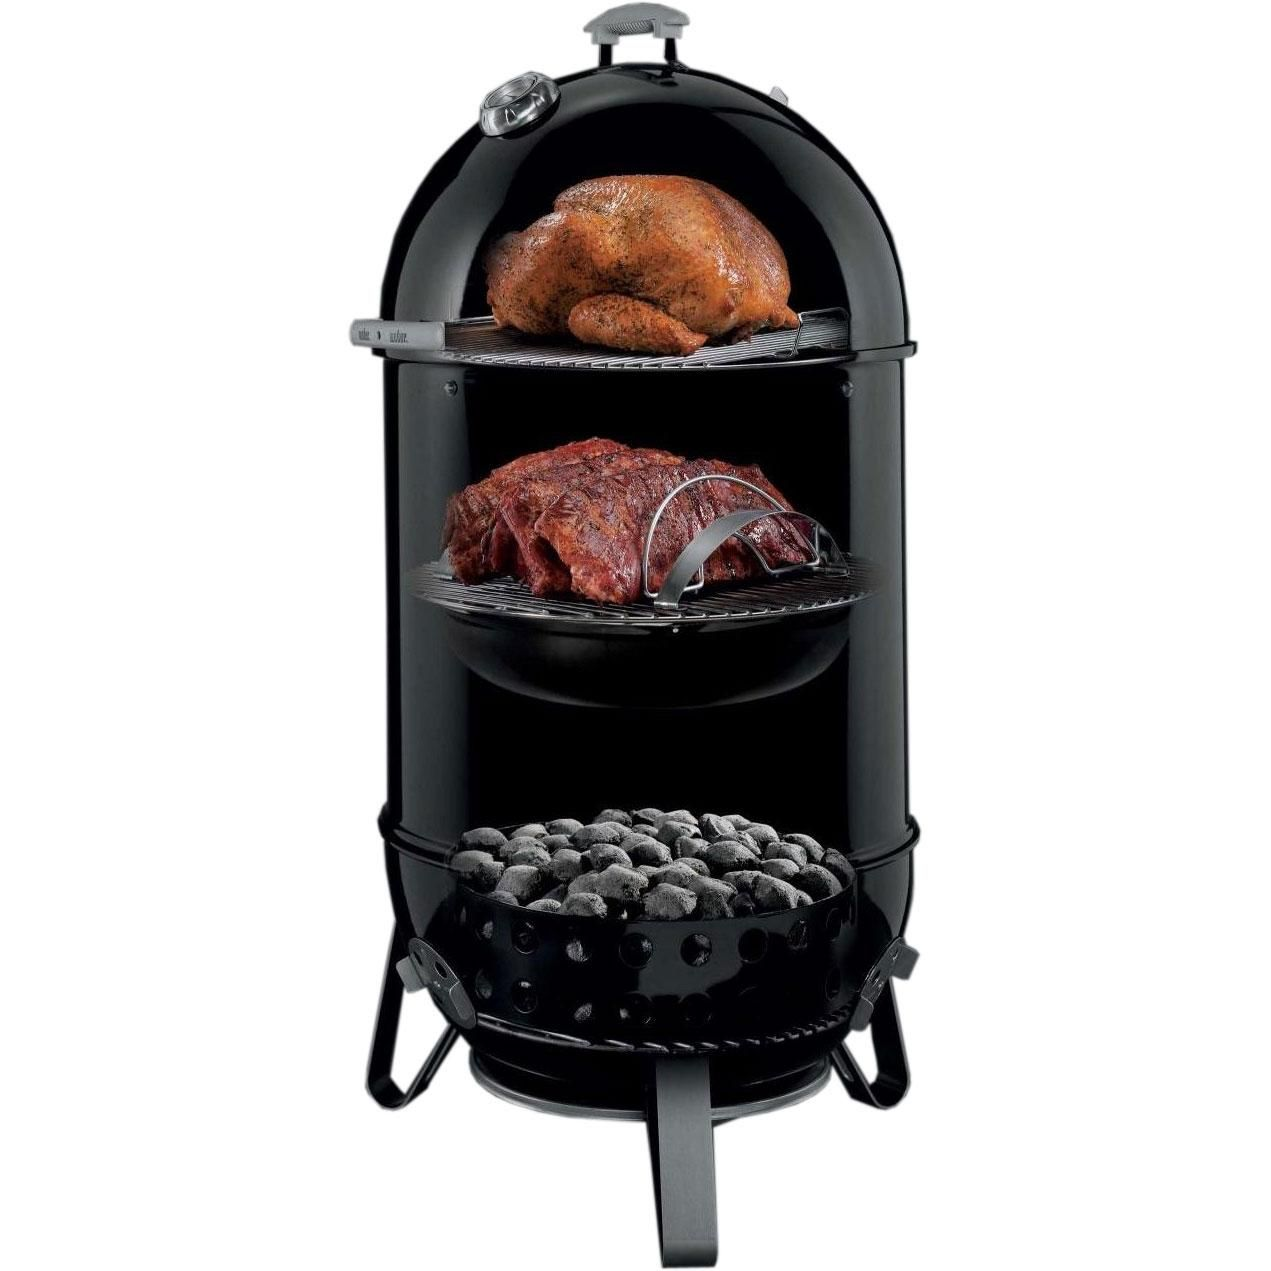 Weber 731001 Smokey Mountain Cooker 22 Inch Charcoal Smoker Bbqguys Charcoal Smoker Best Charcoal Food Temperatures